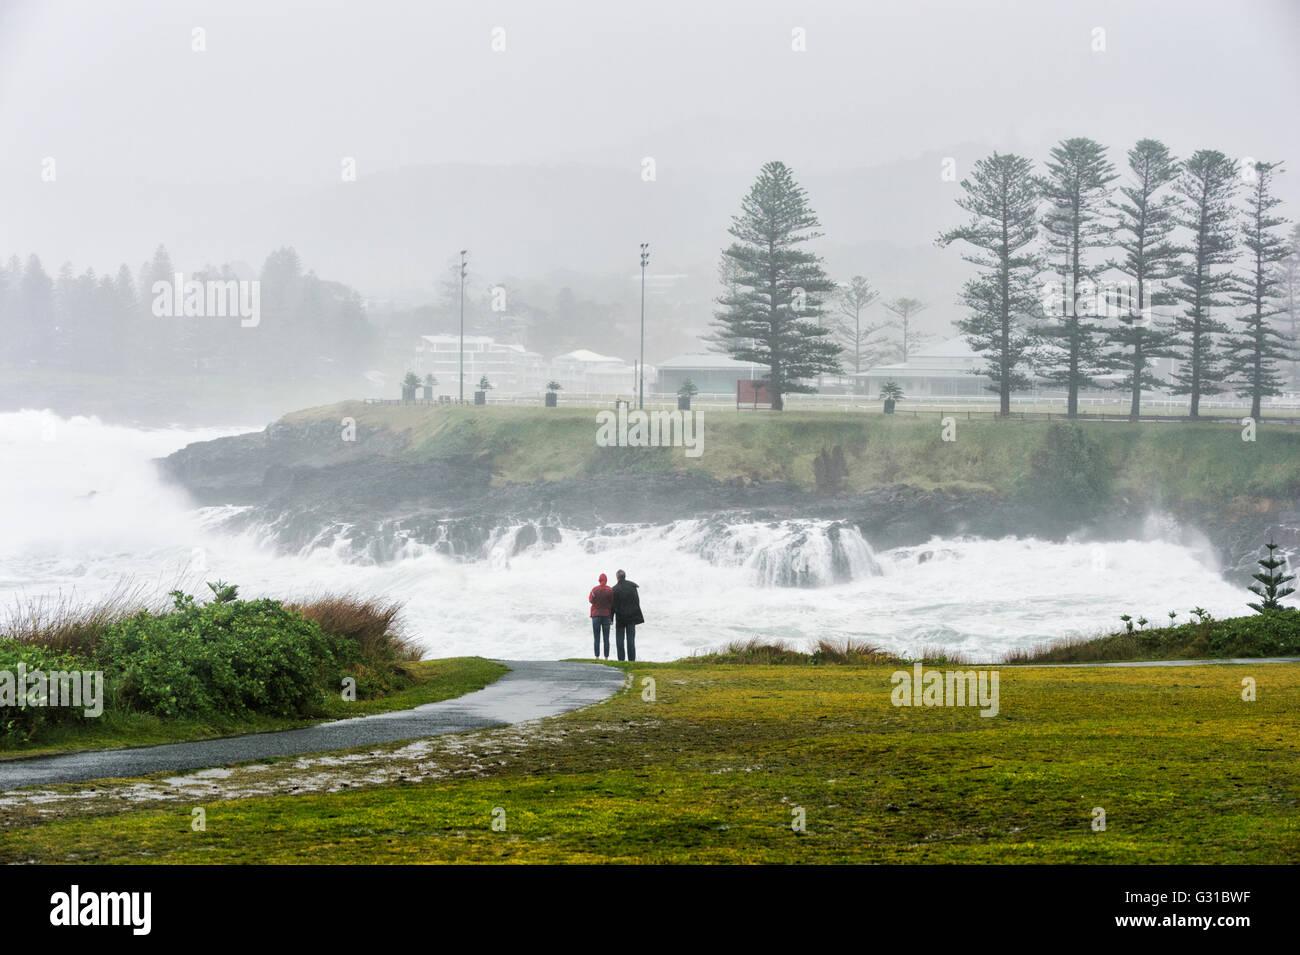 Storm Bay, Kiama Coastline during a severe storm, Illawarra coast, New South Wales, Australia Stock Photo